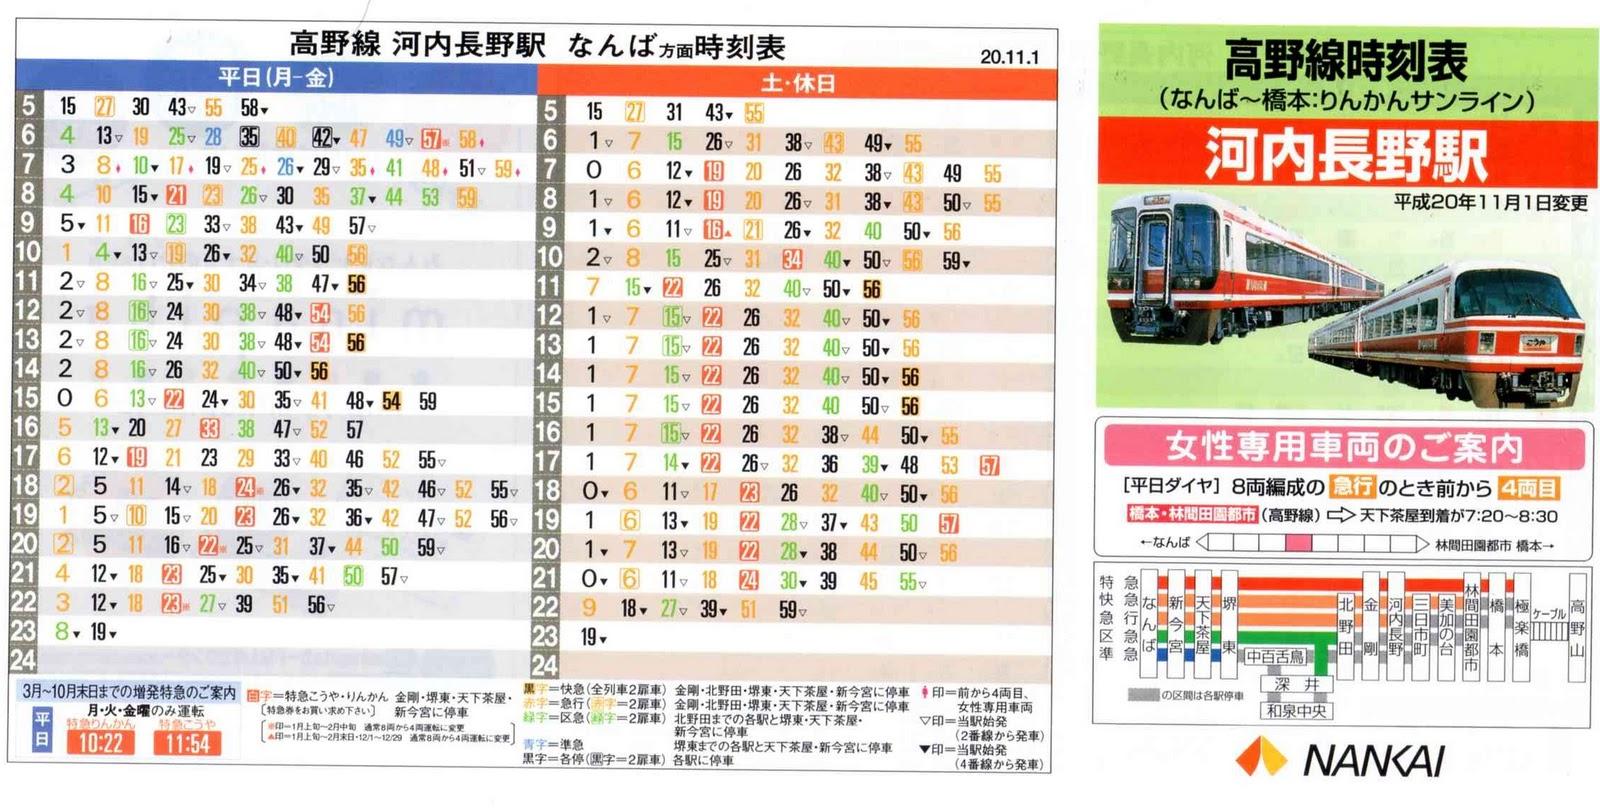 南海 バス 時刻 表 改正情報 南海バス